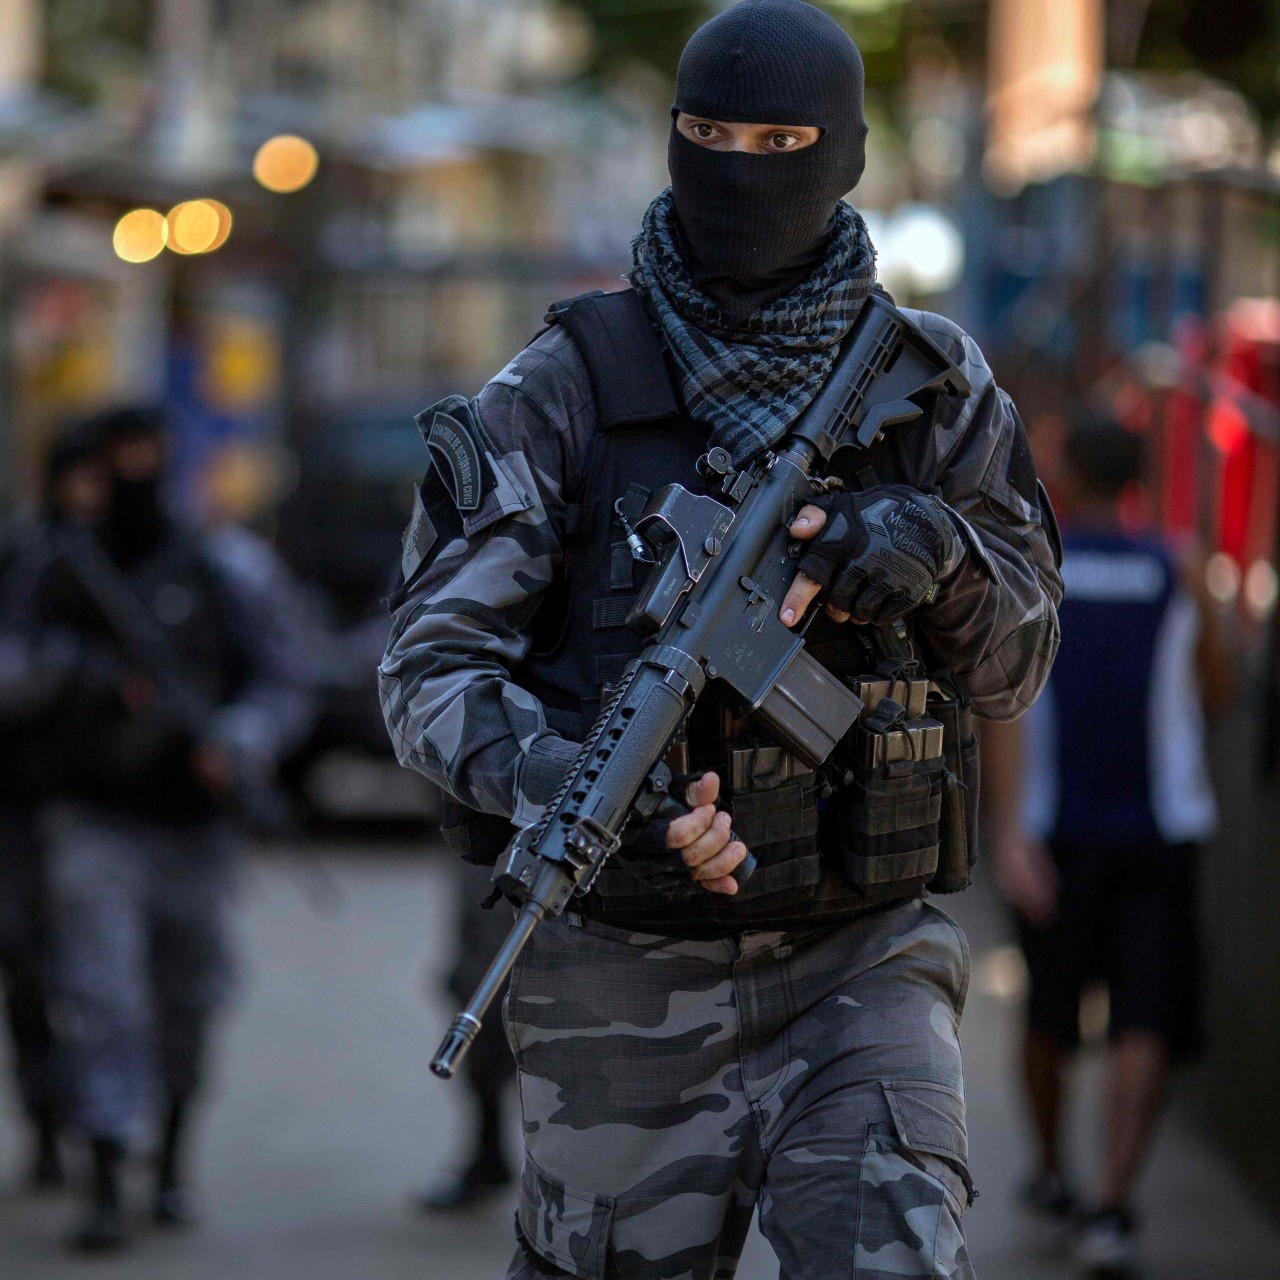 Secret snipers' deployed in Brazil's Rio de Janeiro to take